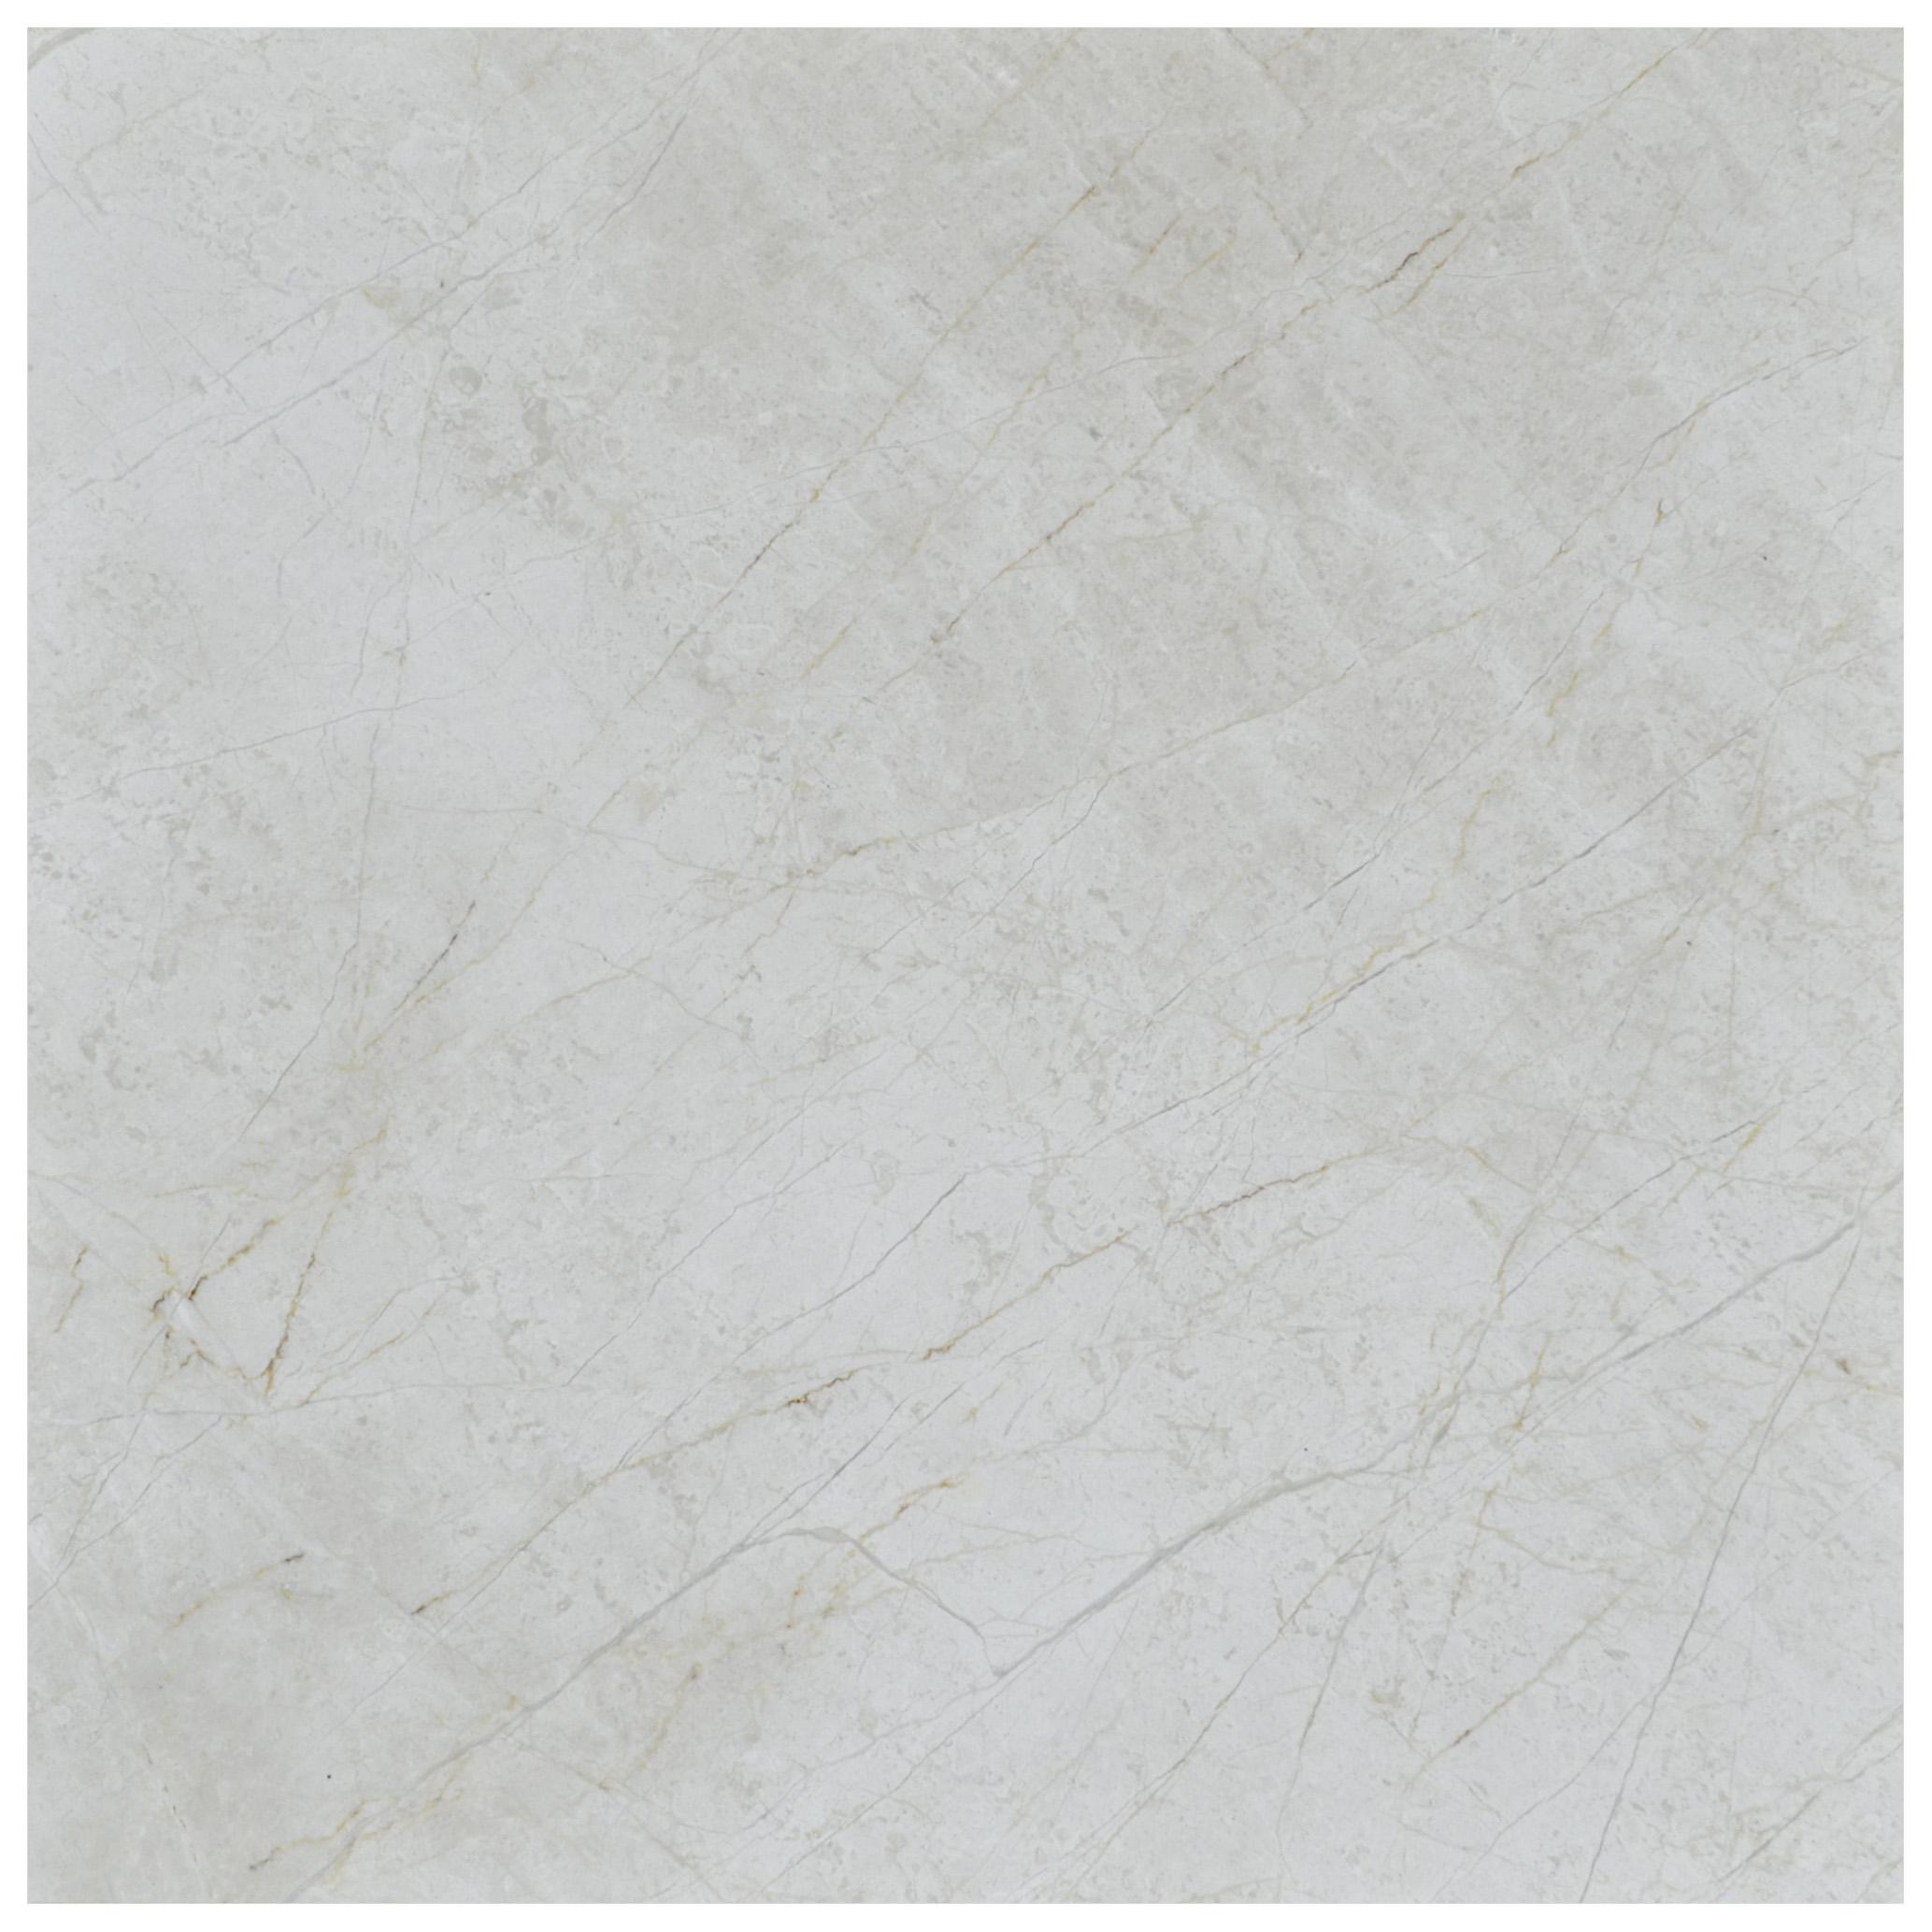 cream nouva polished marble tiles 18x18-marble sale-Atlantic Stone Source